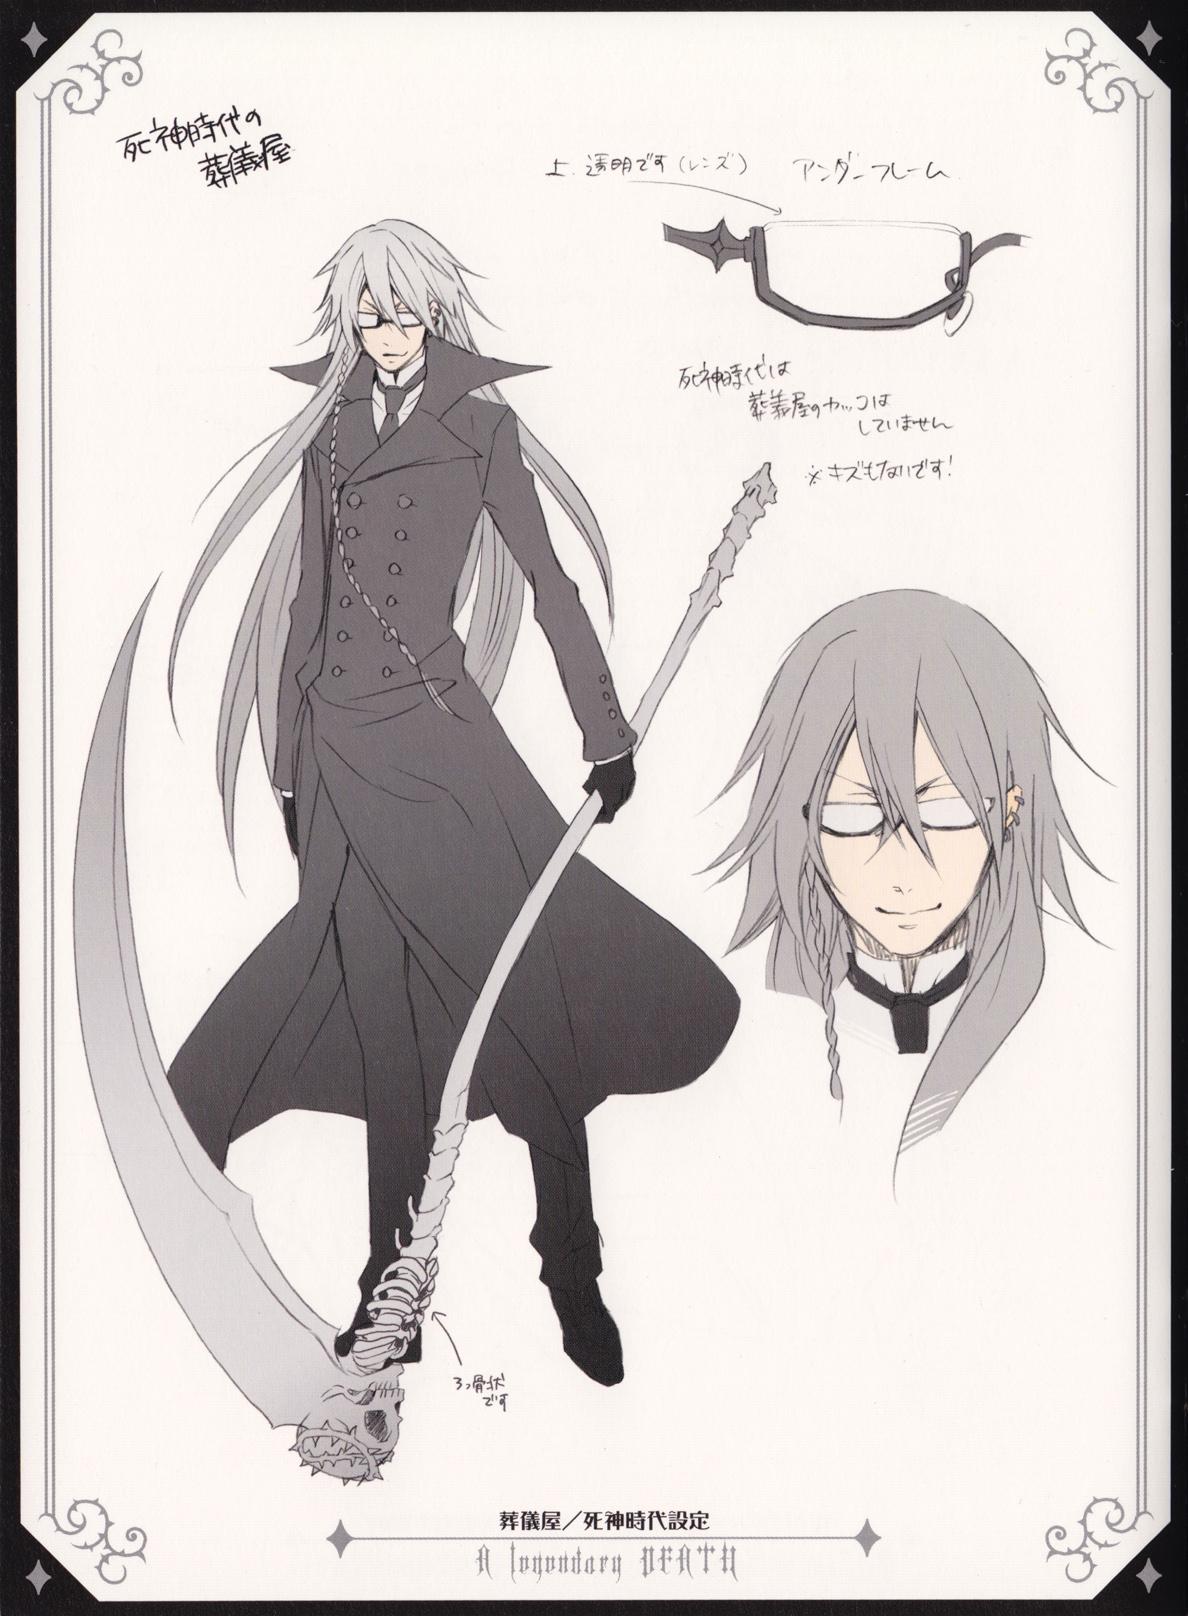 Drawn scythe black butler Kuroshitsuji / Undertaker Kuroshitsuji Butler